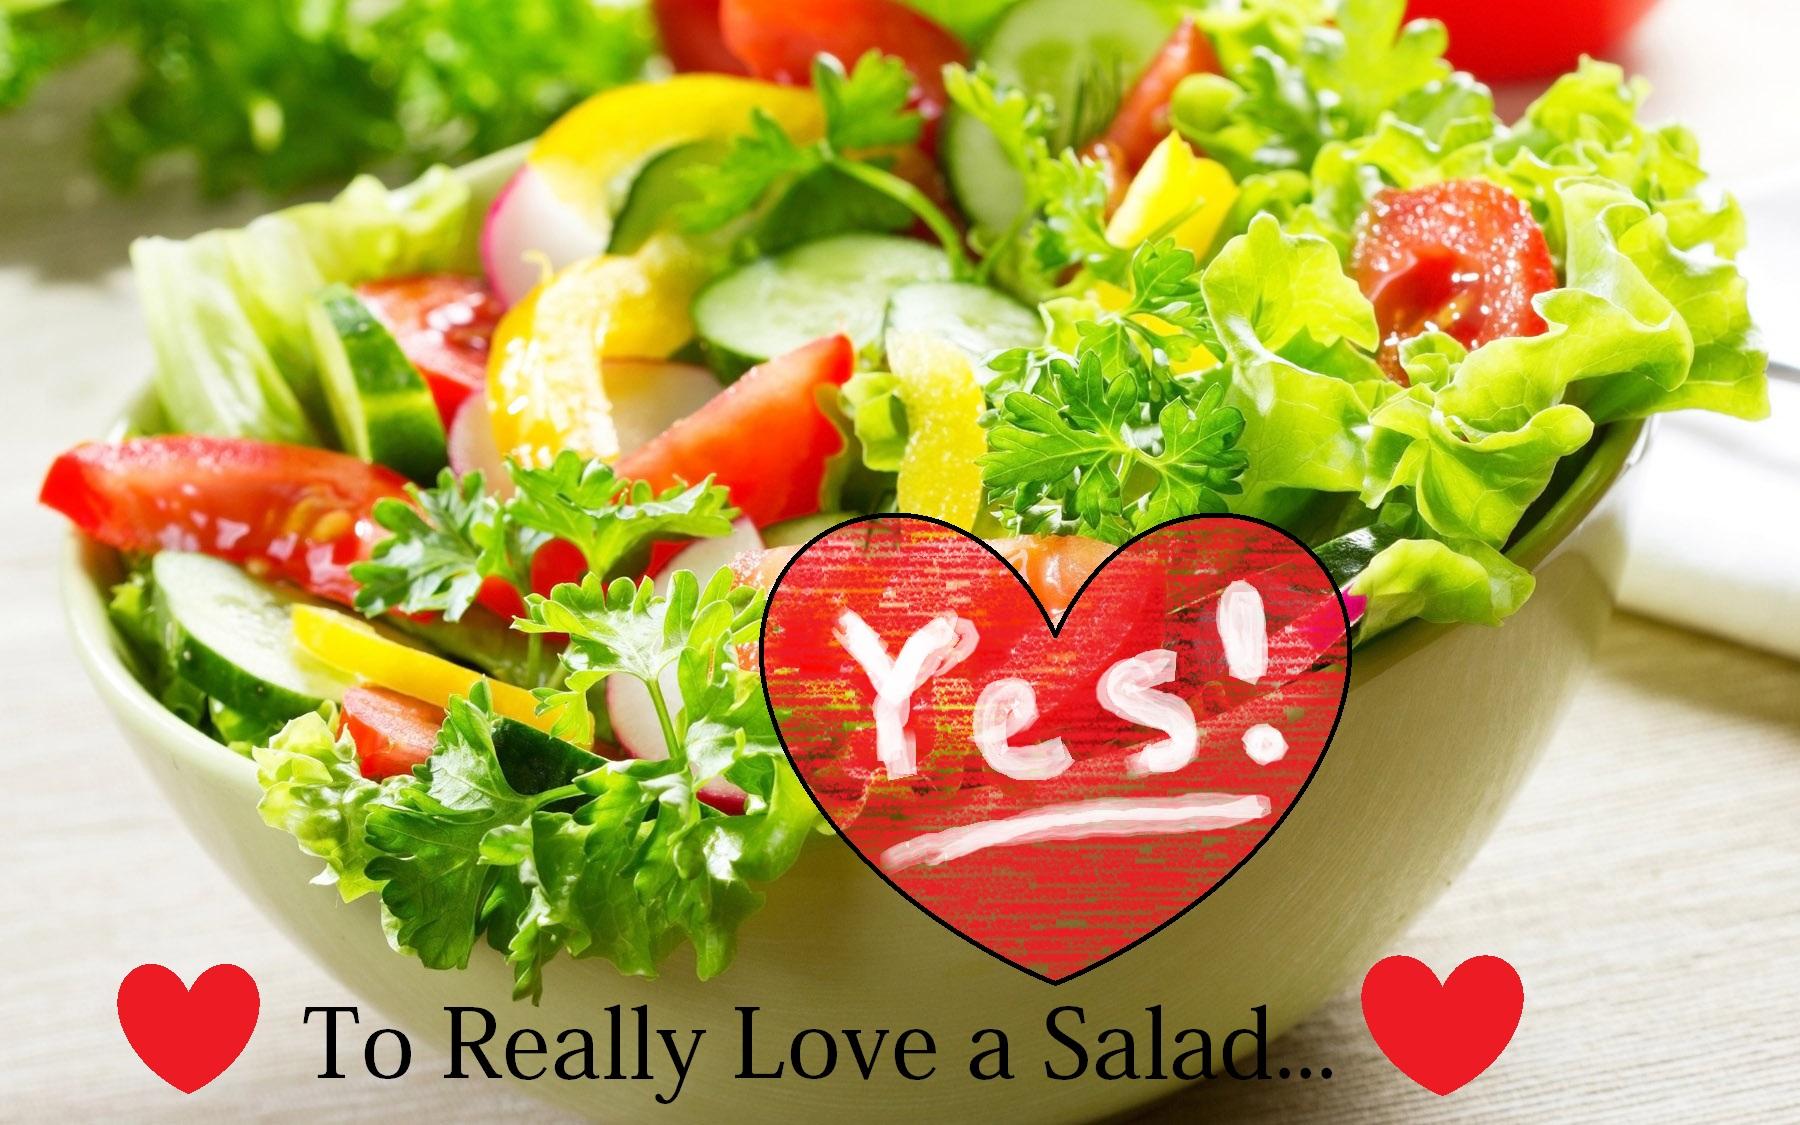 No Calorie salad dressing